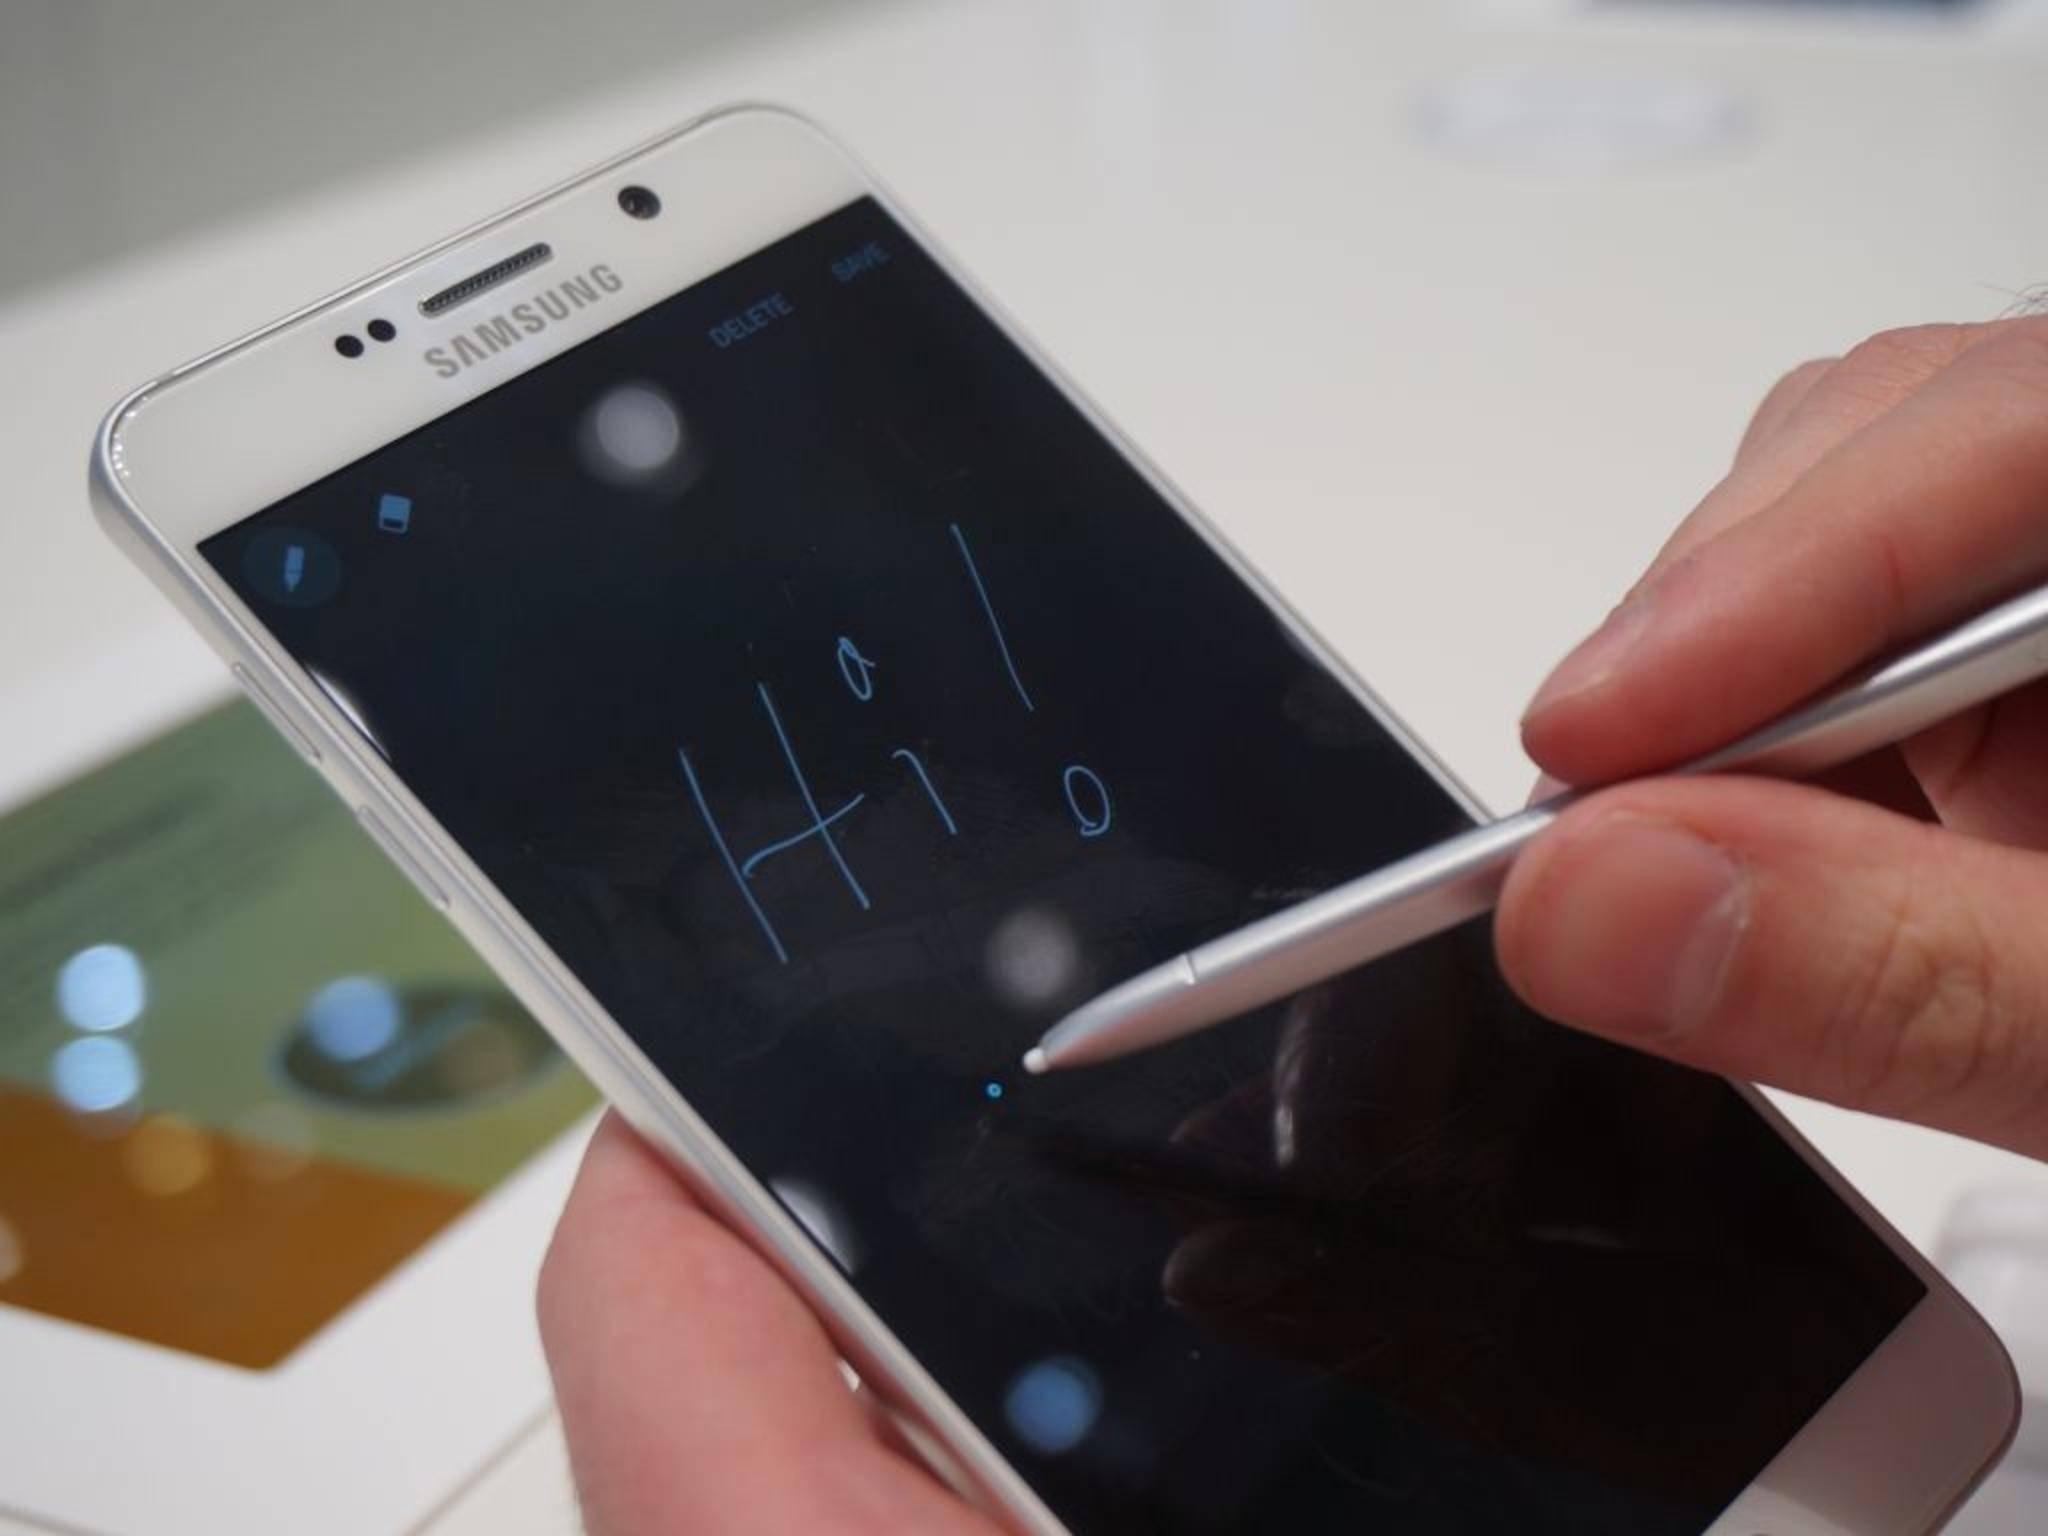 Samsung Galaxy Note 5 5